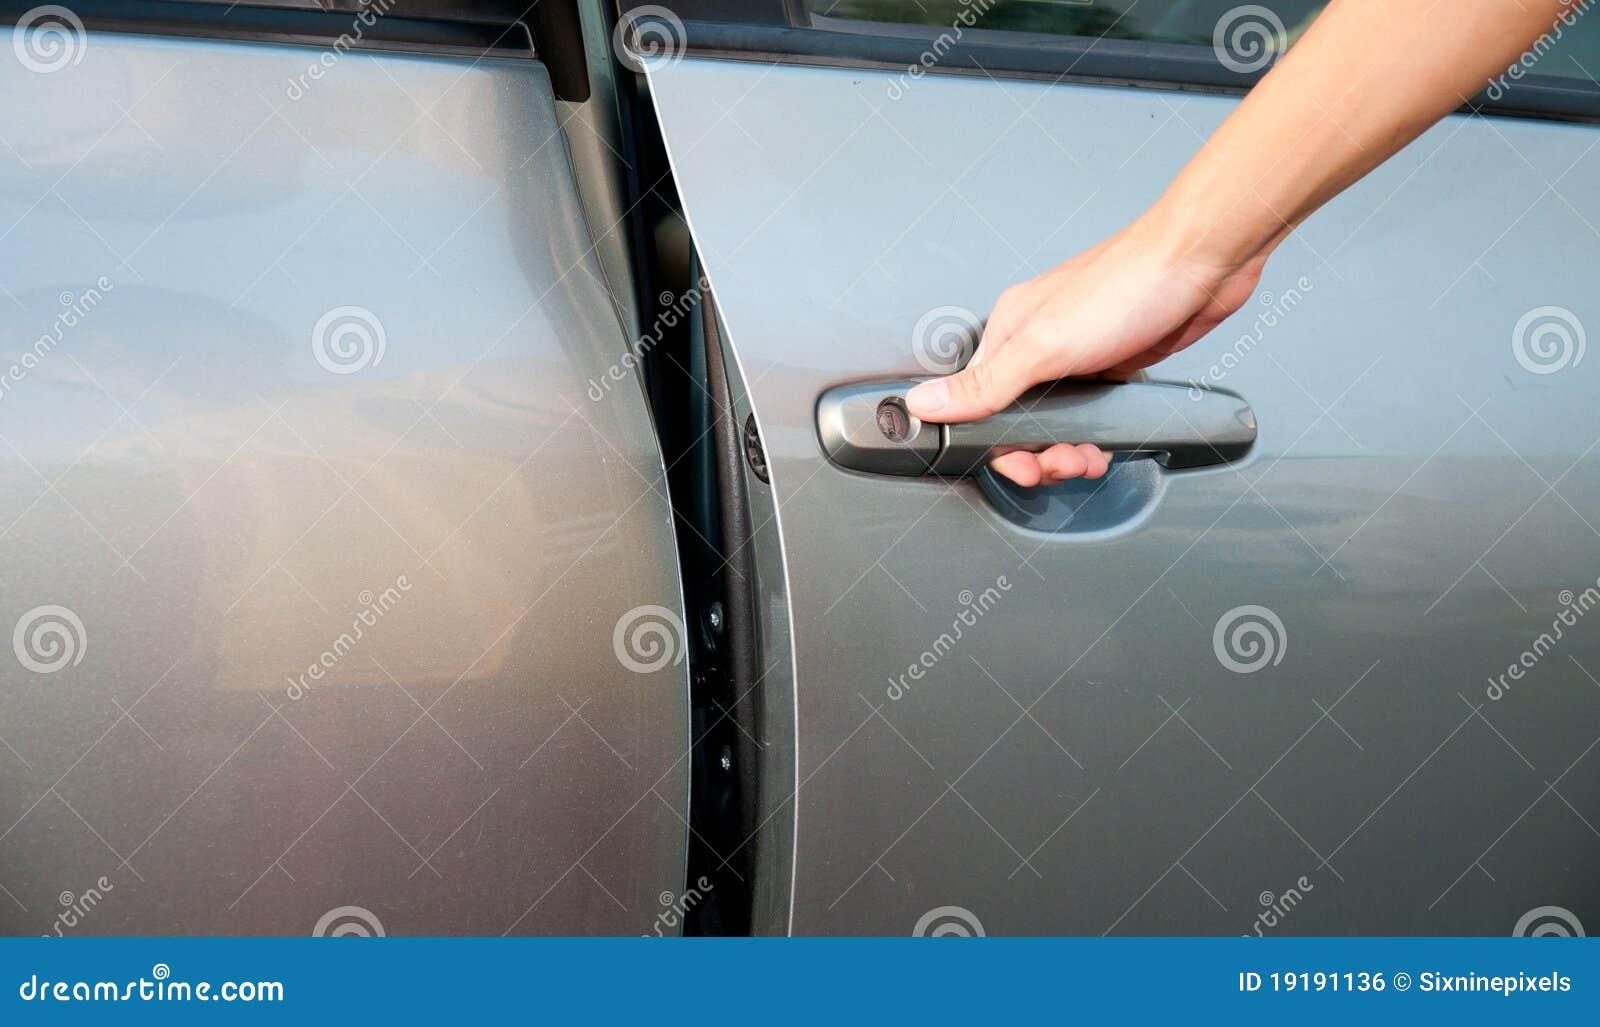 Open Car Door Stock Photo Image Of Hand Driver Male